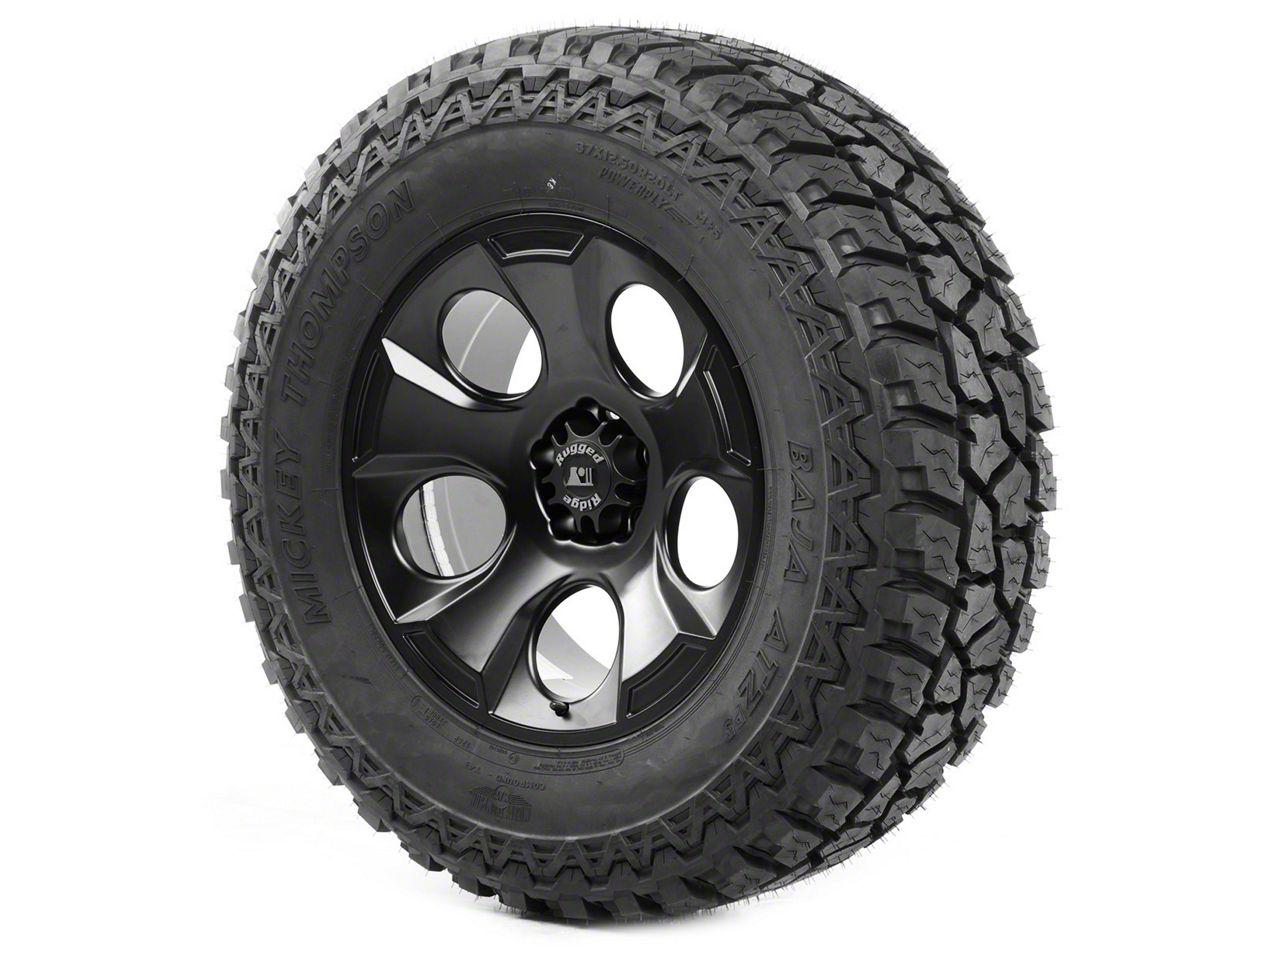 Rugged Ridge Drakon Wheel 20x9 Black Satin and Mickey Thompson ATZ P3 37x12.50x20 Tire (13-18 Jeep Wrangler JK; 2018 Jeep Wrangler JL)